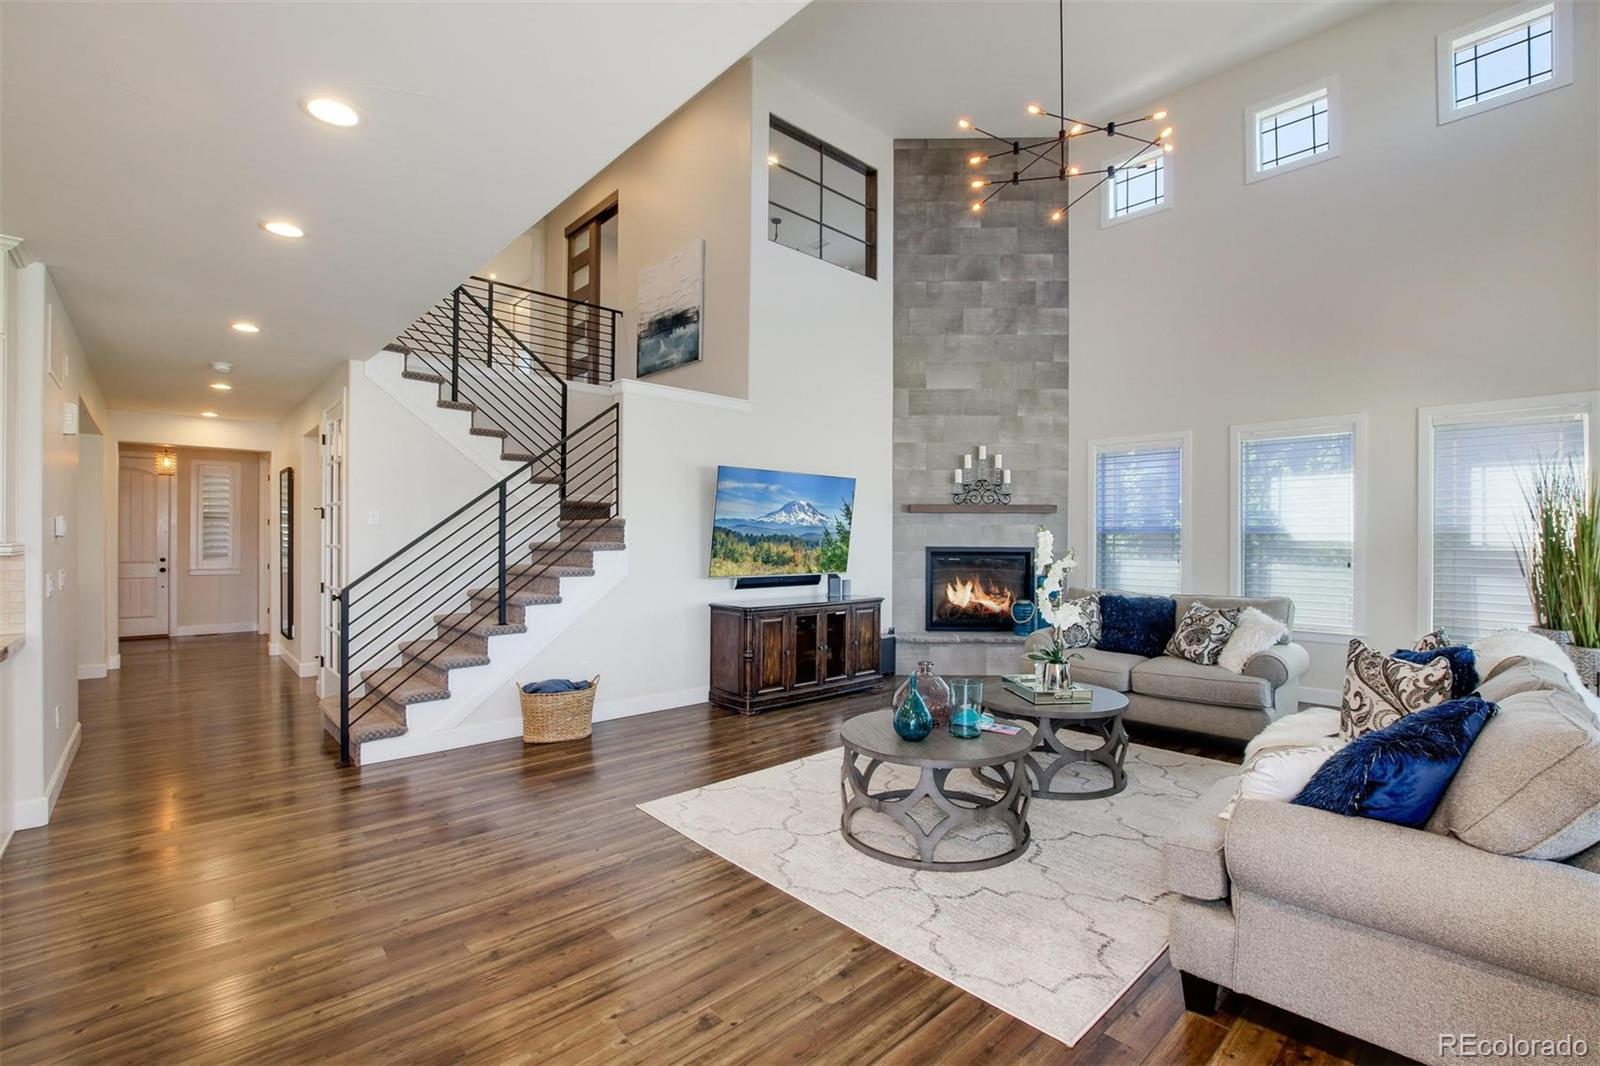 10721 Skydance Drive, Highlands Ranch, CO 80126 - Highlands Ranch, CO real estate listing